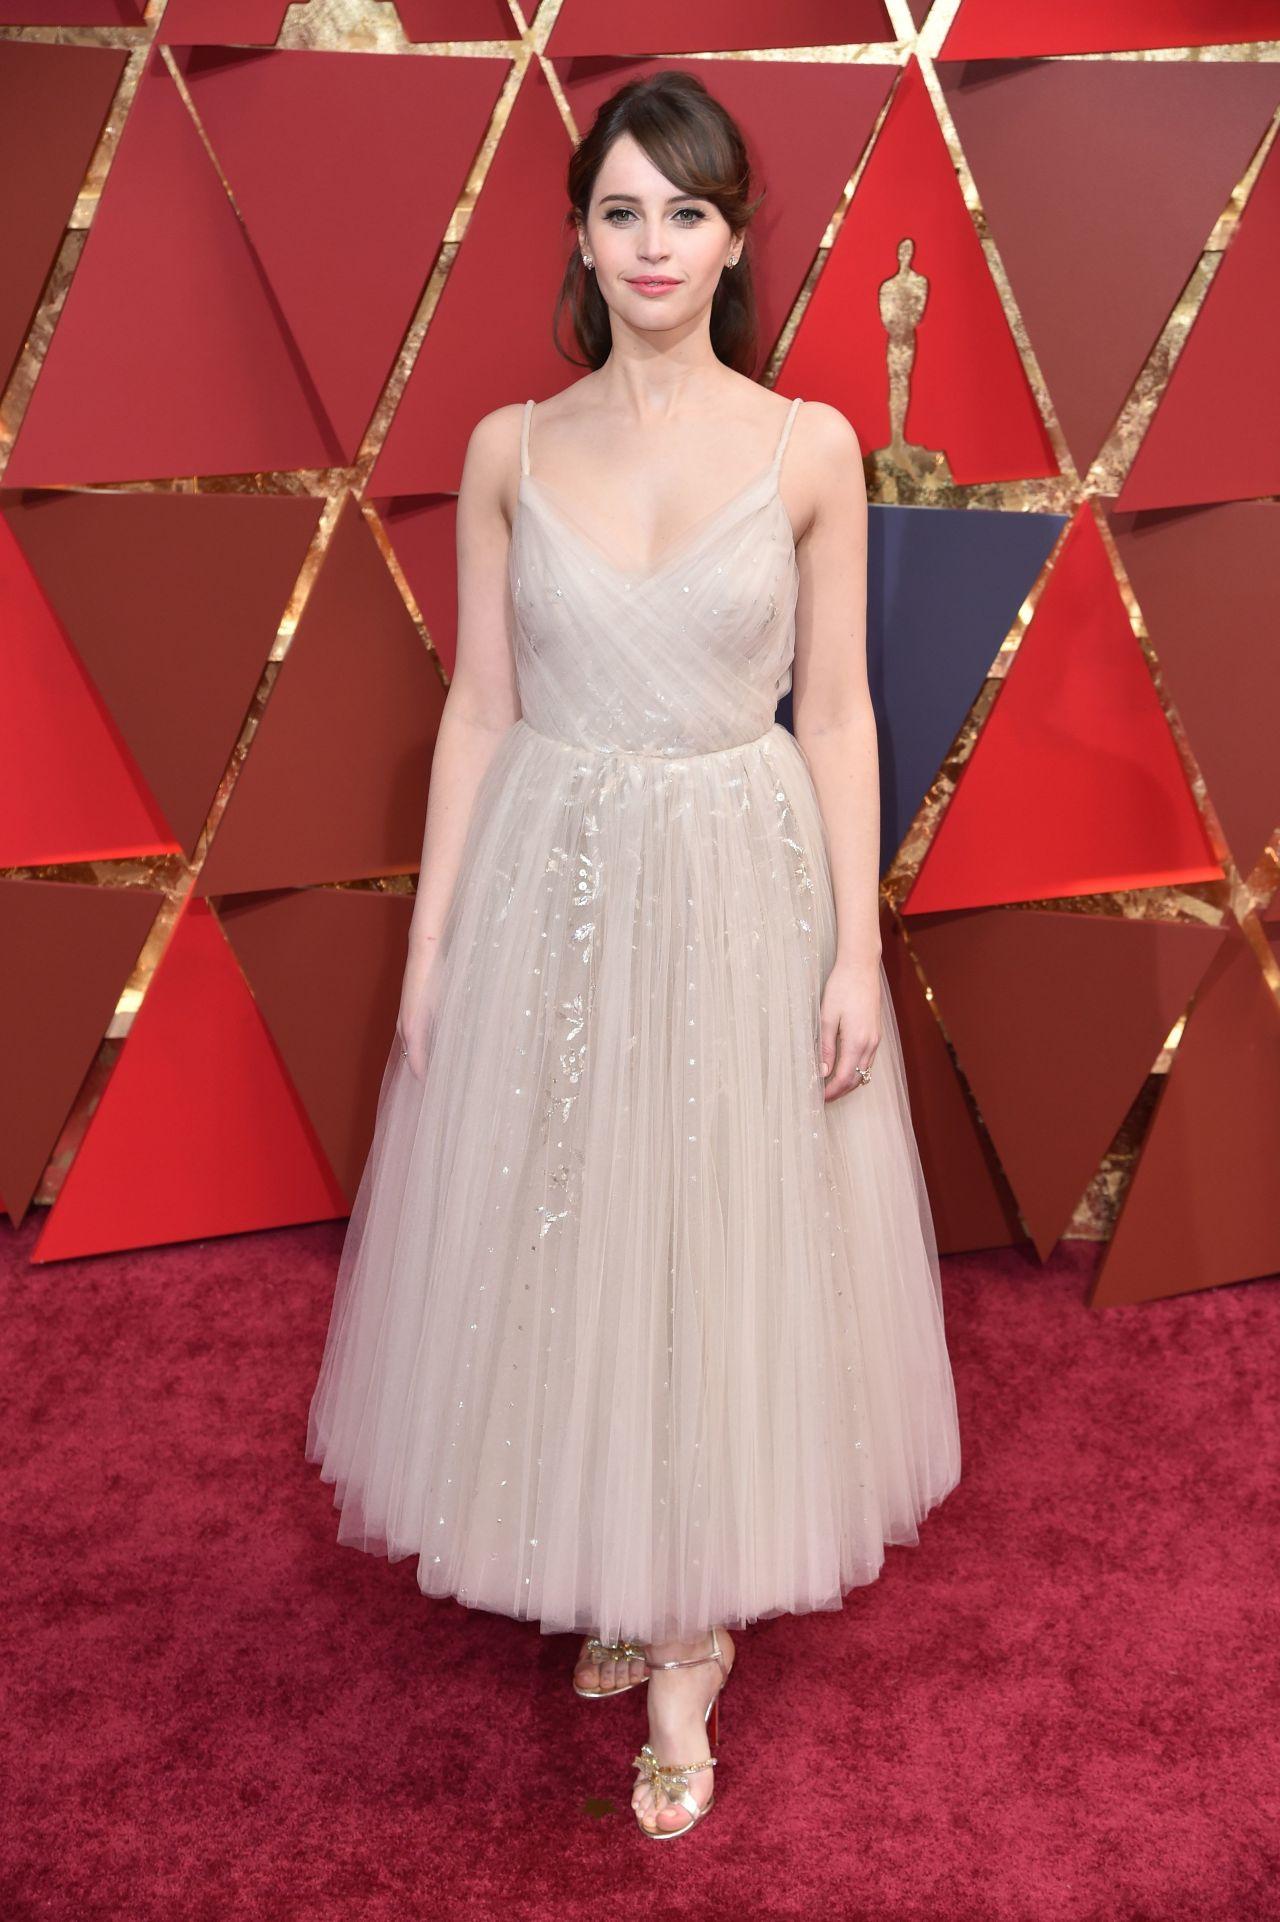 http://celebmafia.com/wp-content/uploads/2017/02/felicity-jones-oscars-2017-red-carpet-in-hollywood-part-ii-11.jpg